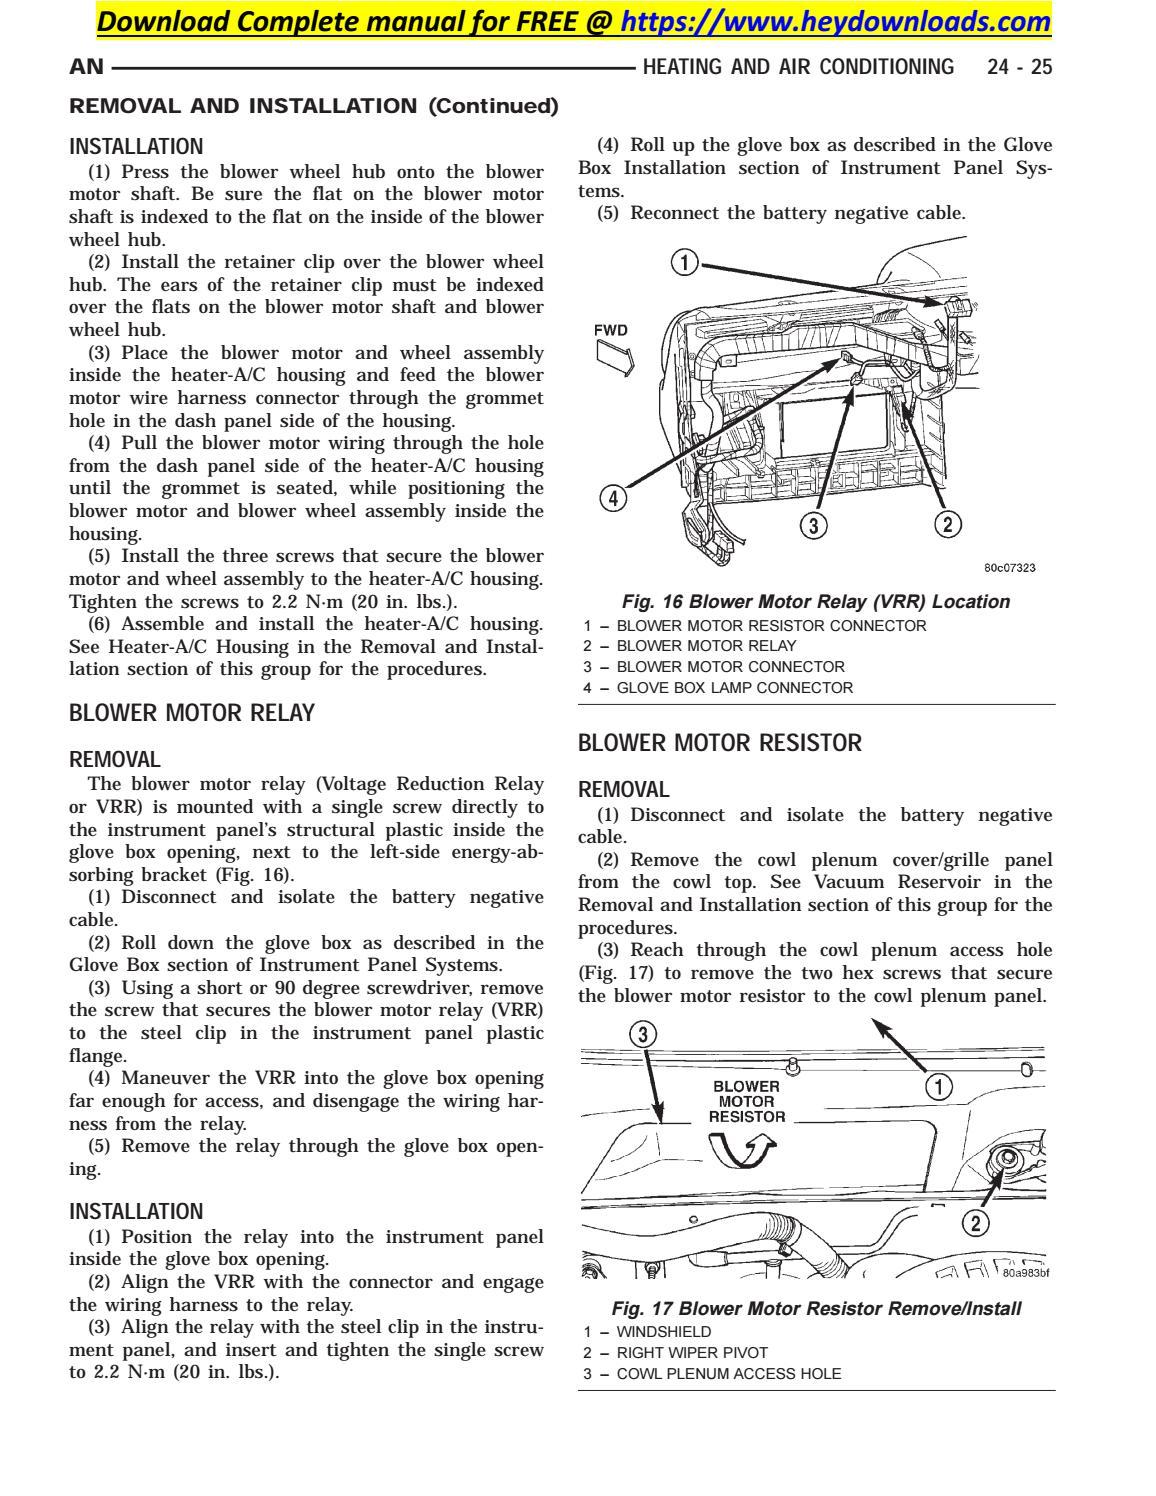 2002 Dodge Dakota Blower Motor Resistor Wiring Harness from image.isu.pub